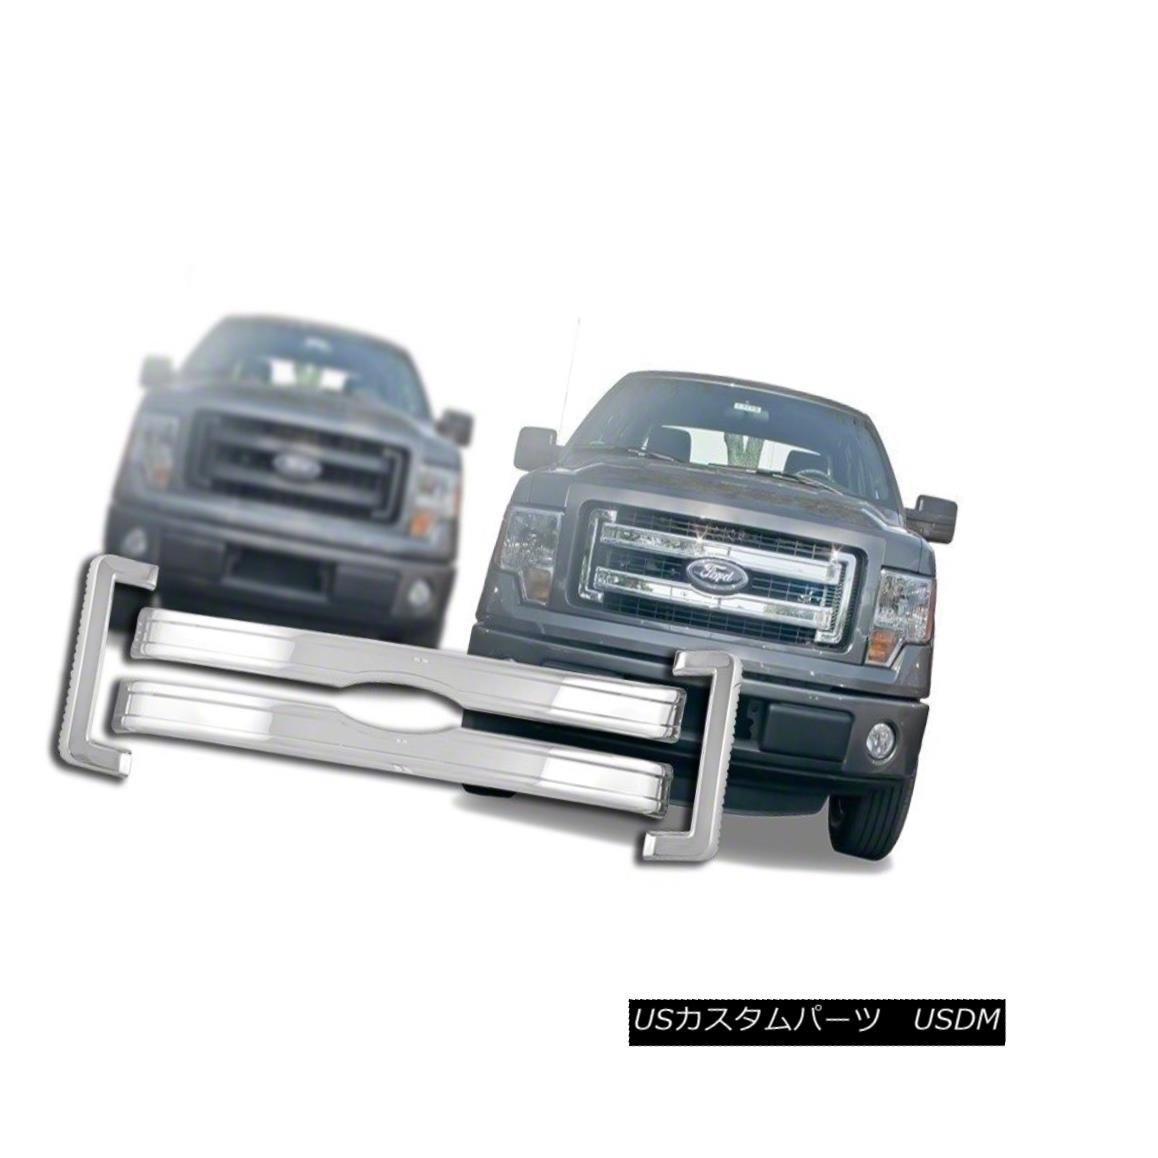 USグリル Chrome Grille Overlay-Fits 2013-14 Ford F150-IWCGI113 Chromeグリルオーバーレイ - 2013-14 Ford F150-IWCGI113に適合